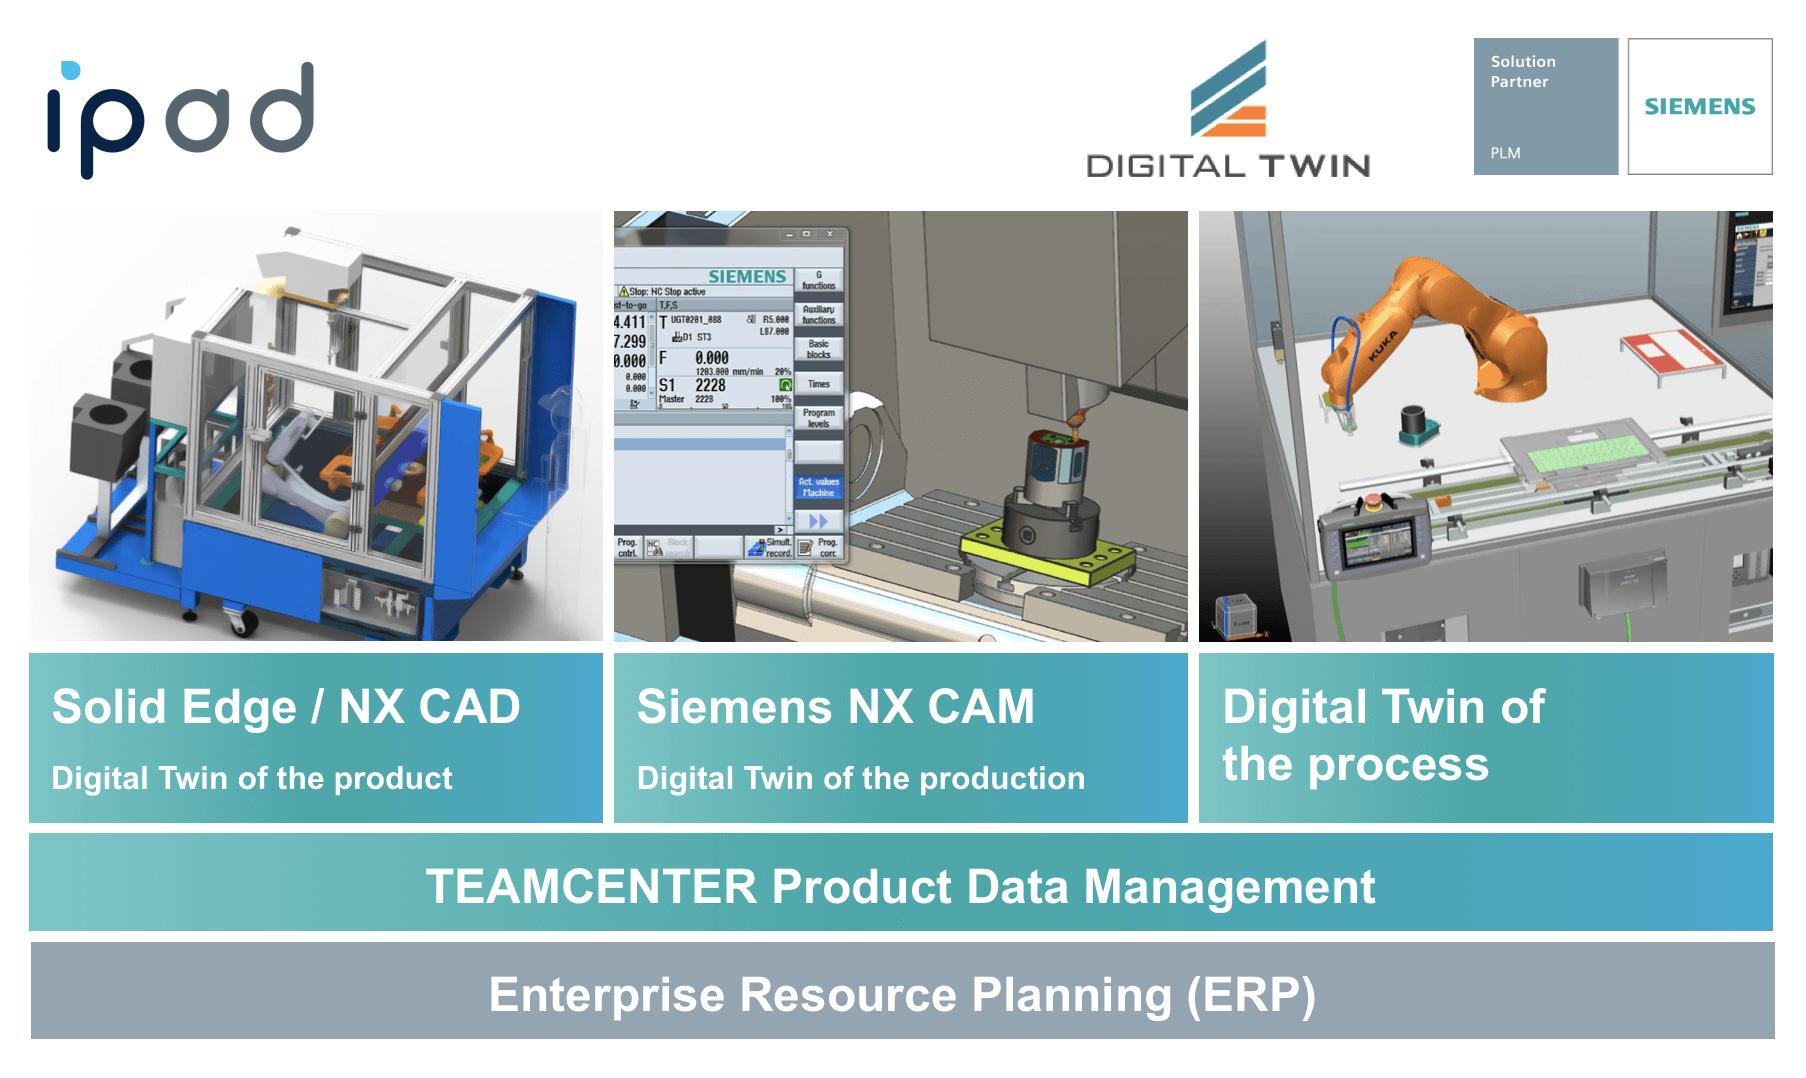 solutie-integrata-cad-cam-pdm-siemens-digital-twin